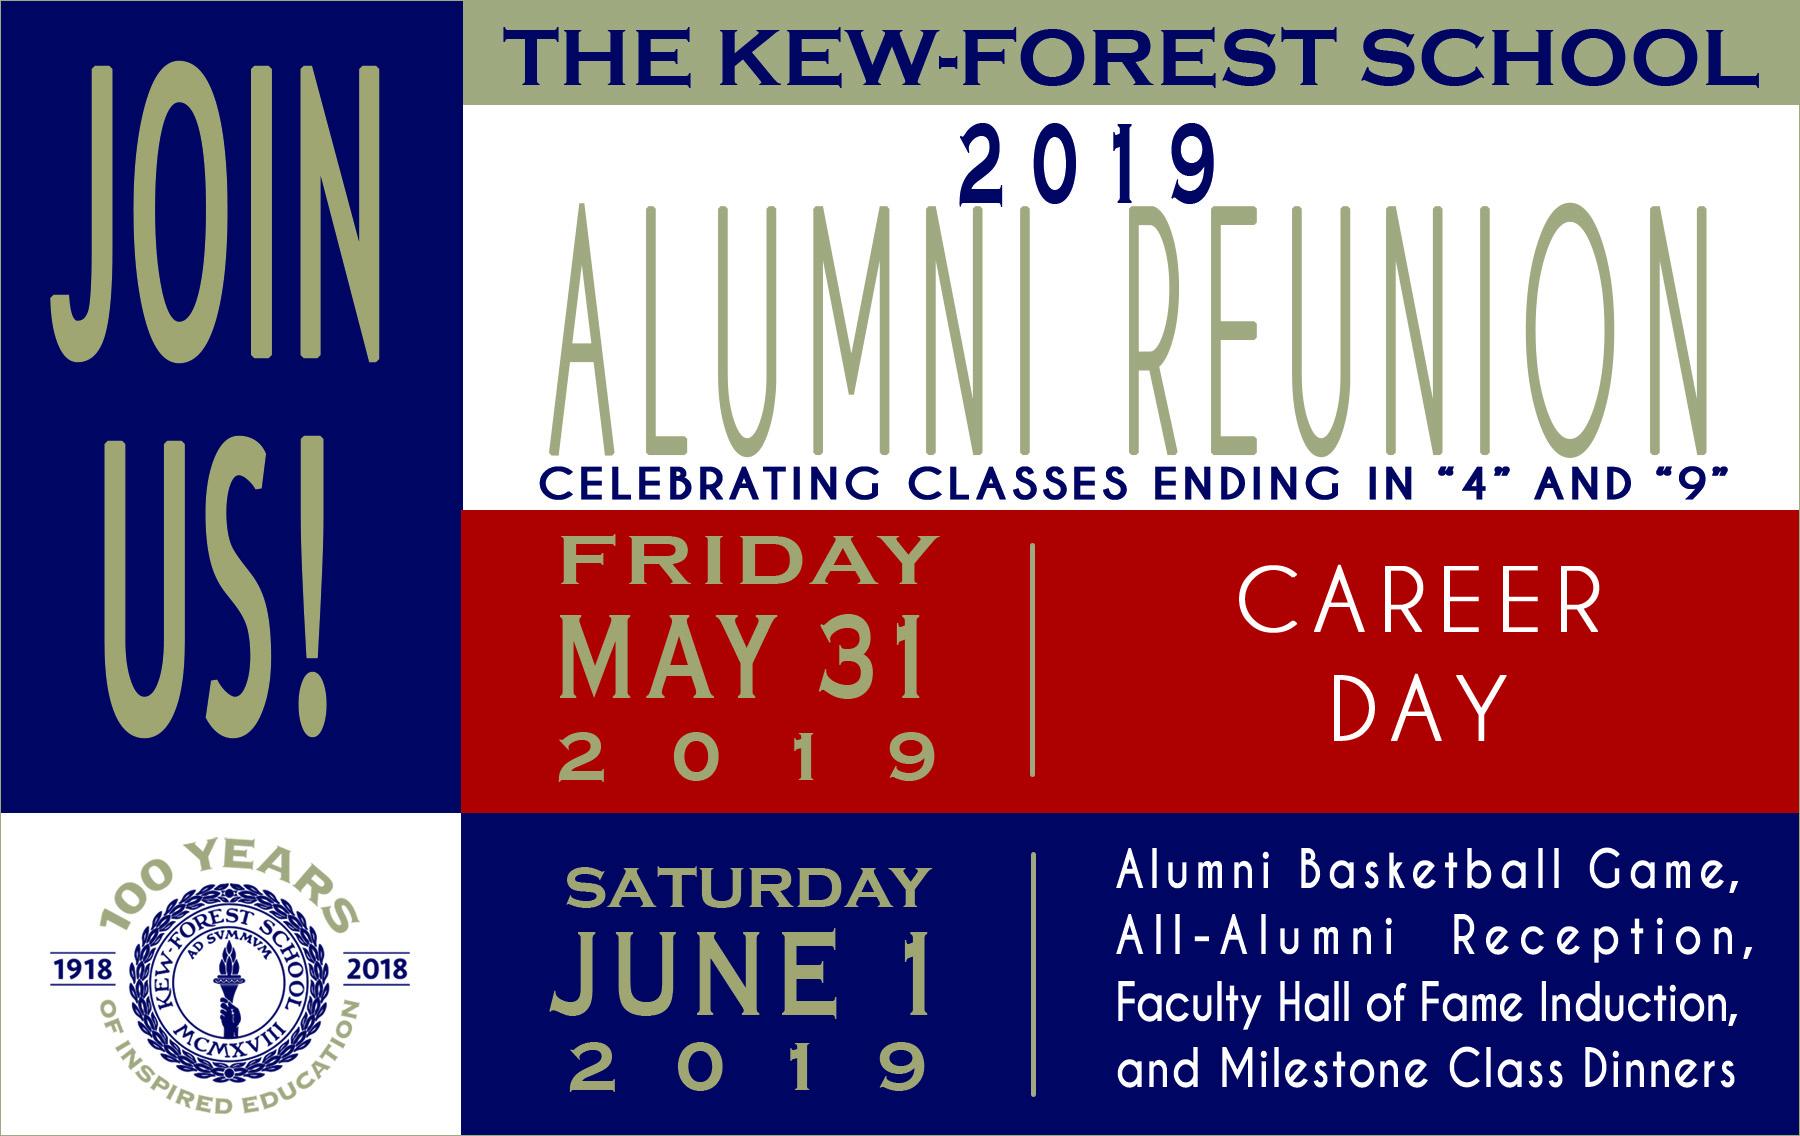 2019 Alumni Reunion JOIN US-LGL Banner.jpg